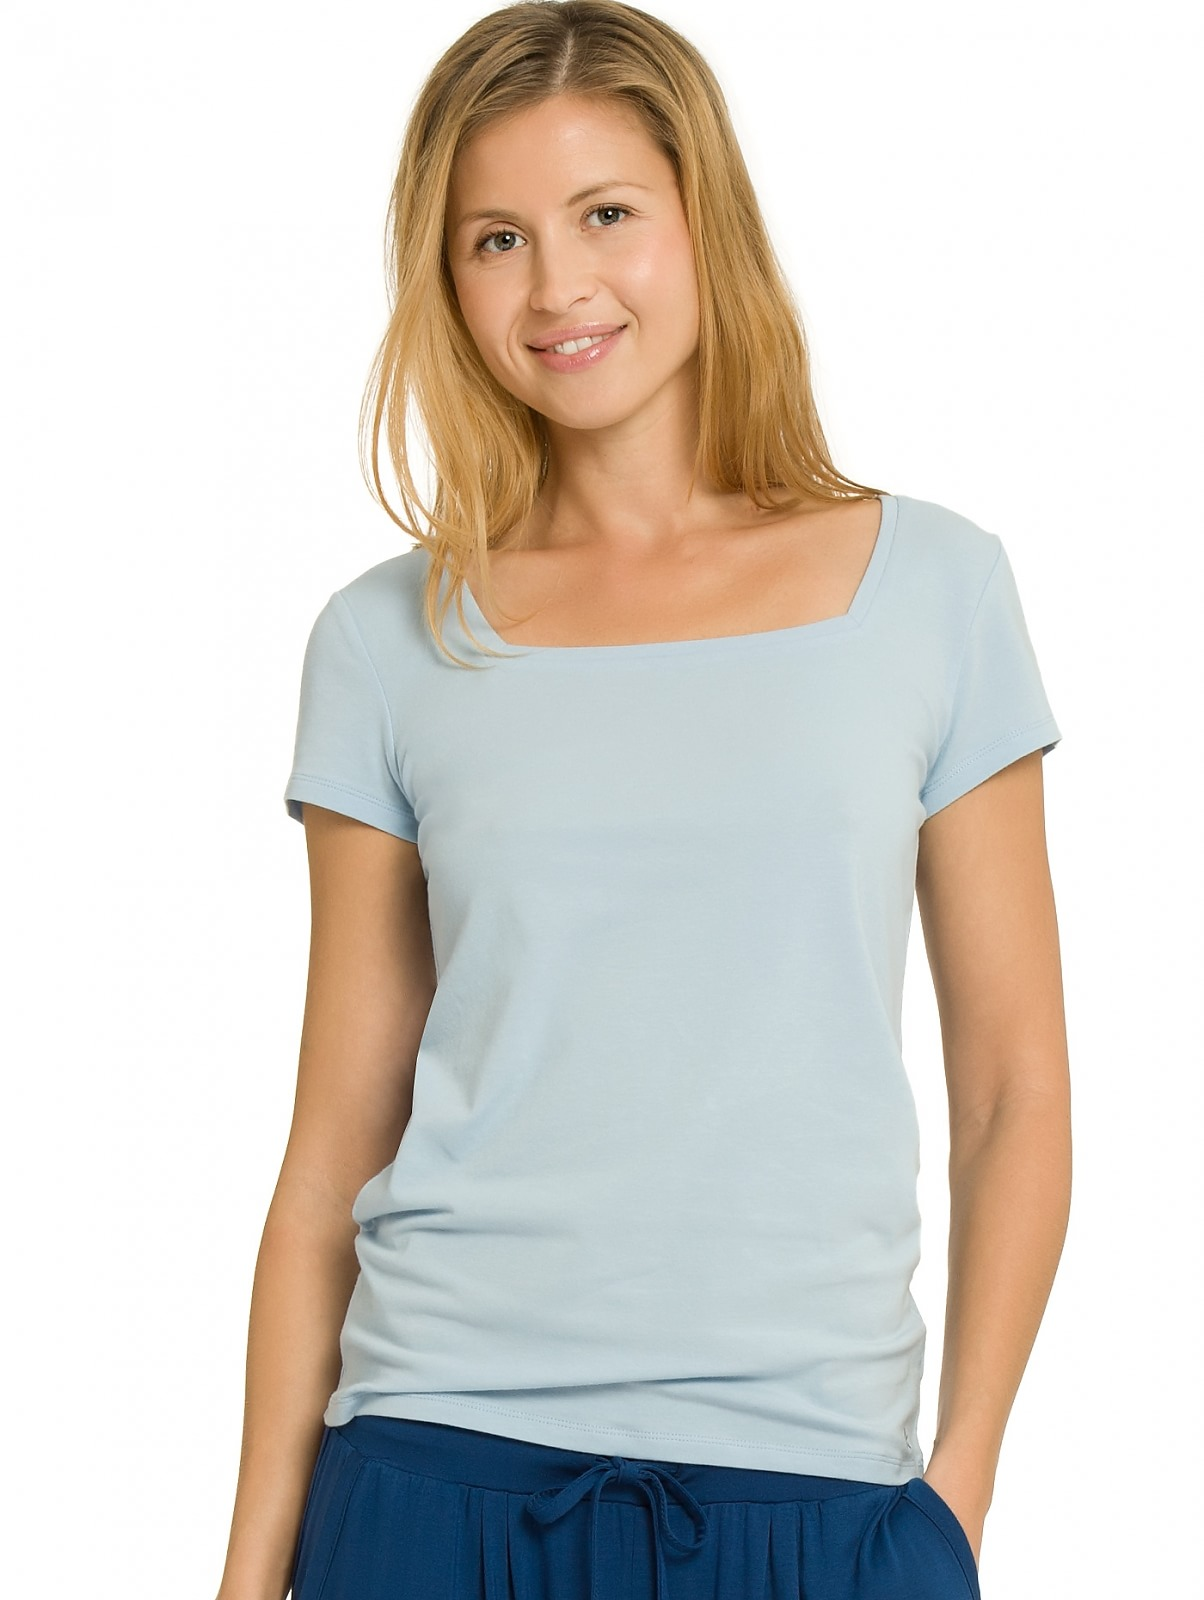 Dámské tričko QS1687E - Calvin Klein sv.modrá M